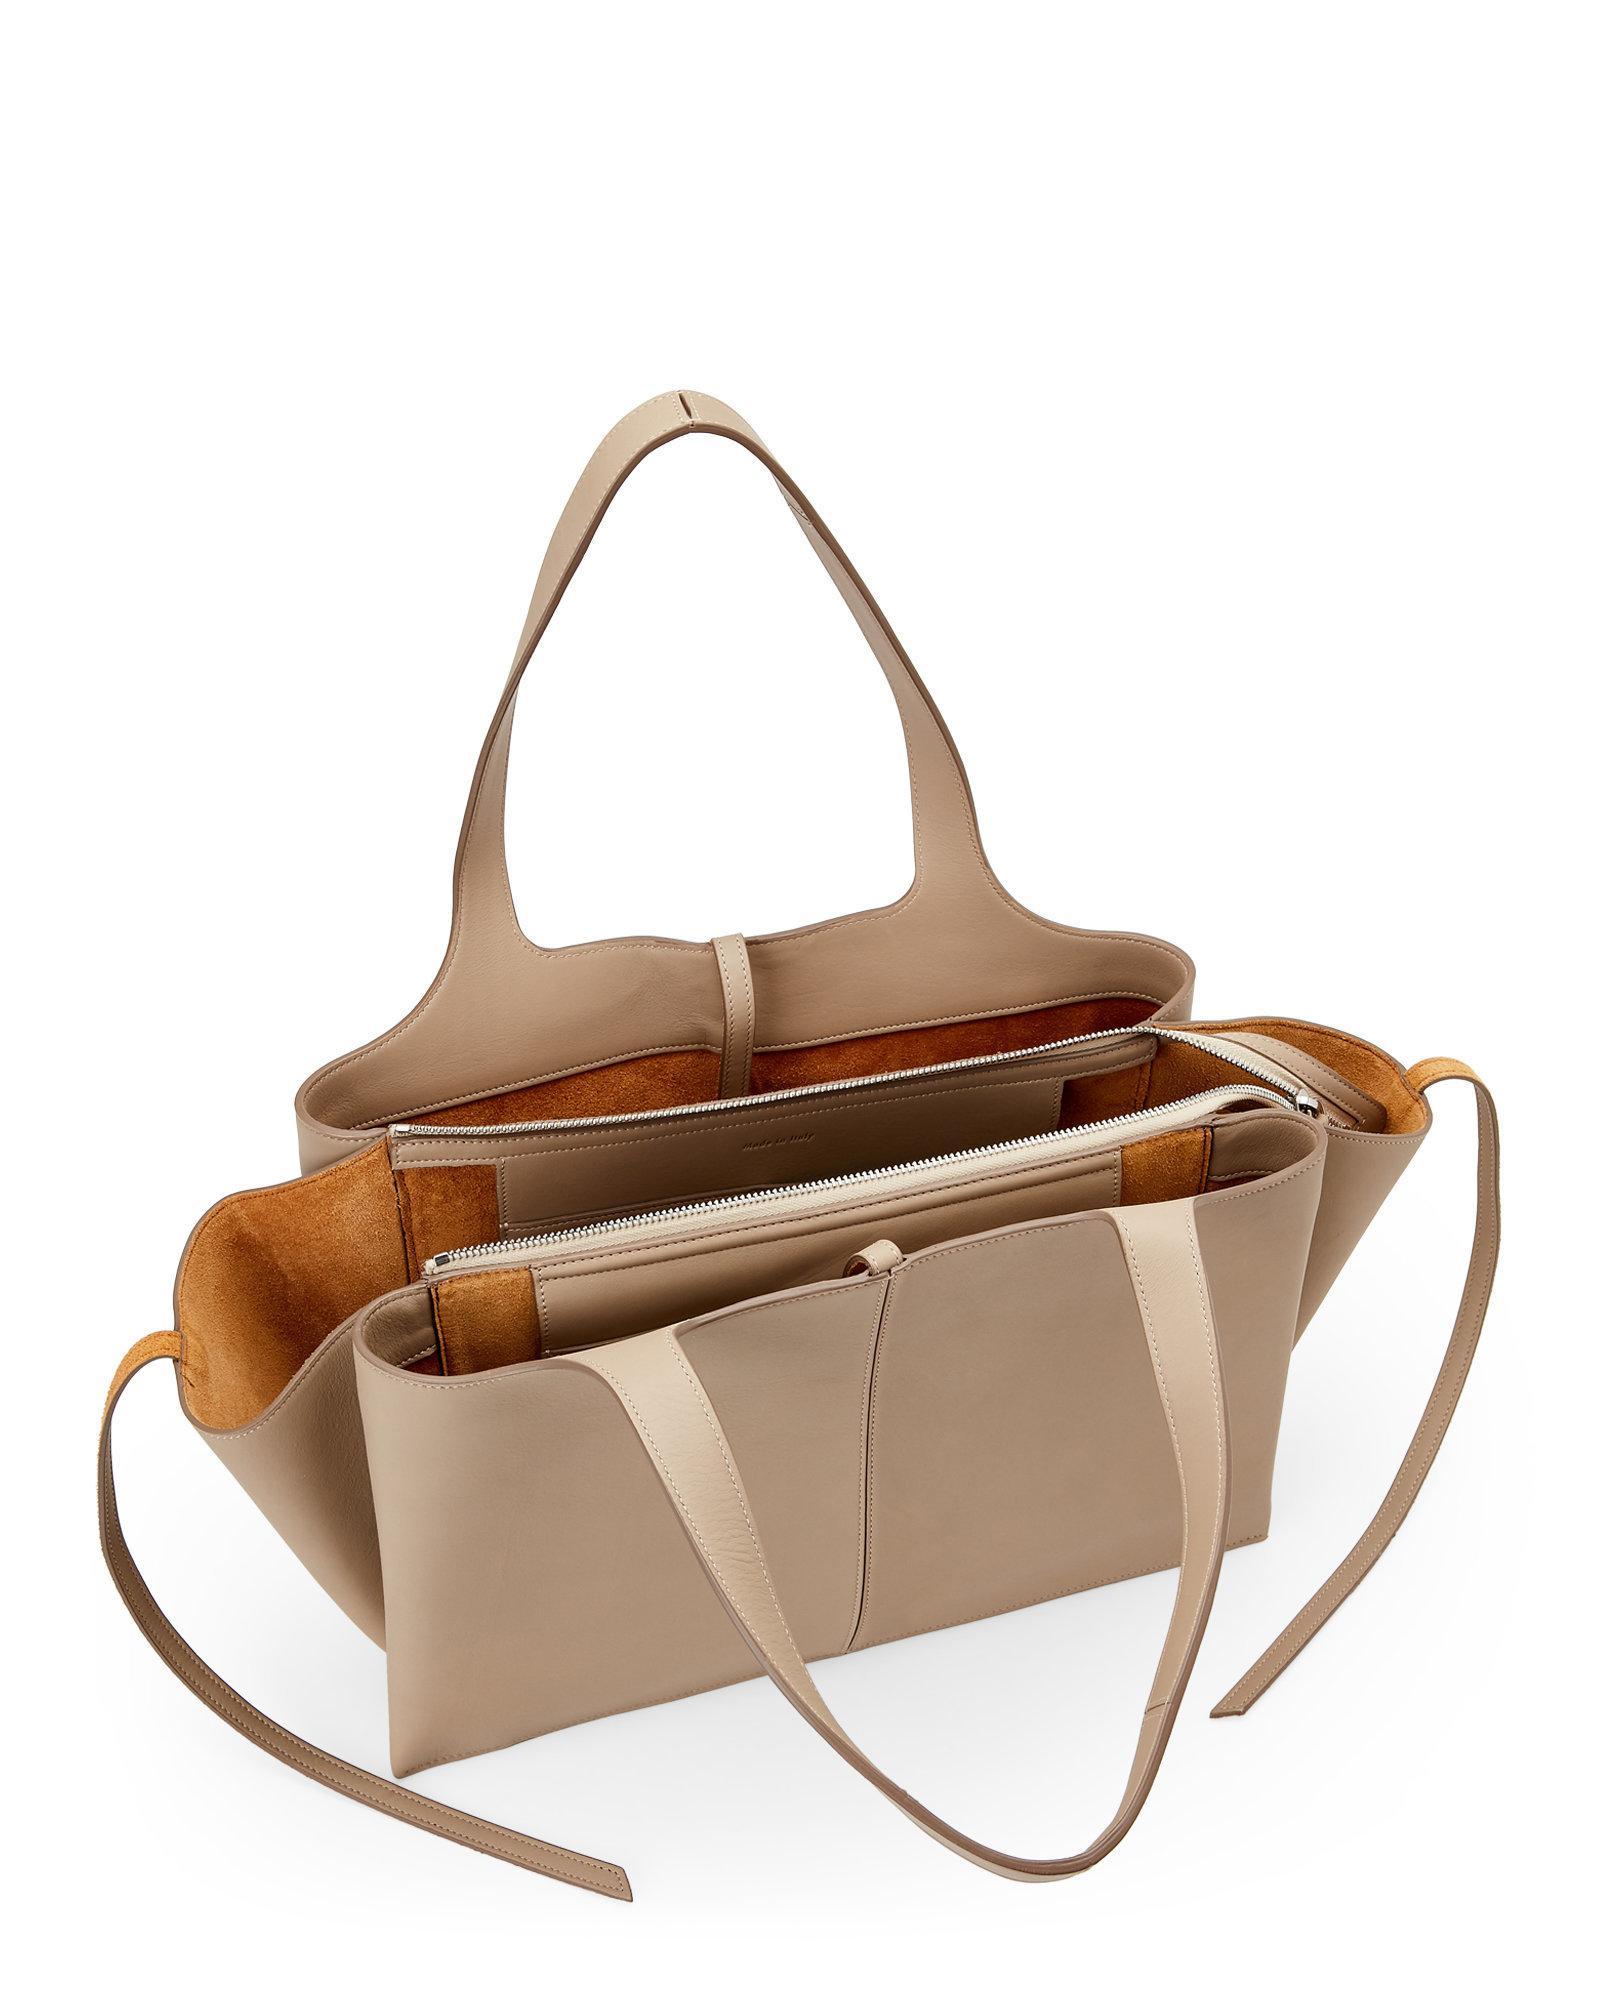 25f62fd49982 Lyst - Céline Pale Beige Medium Tri-Fold Shoulder Bag in Natural